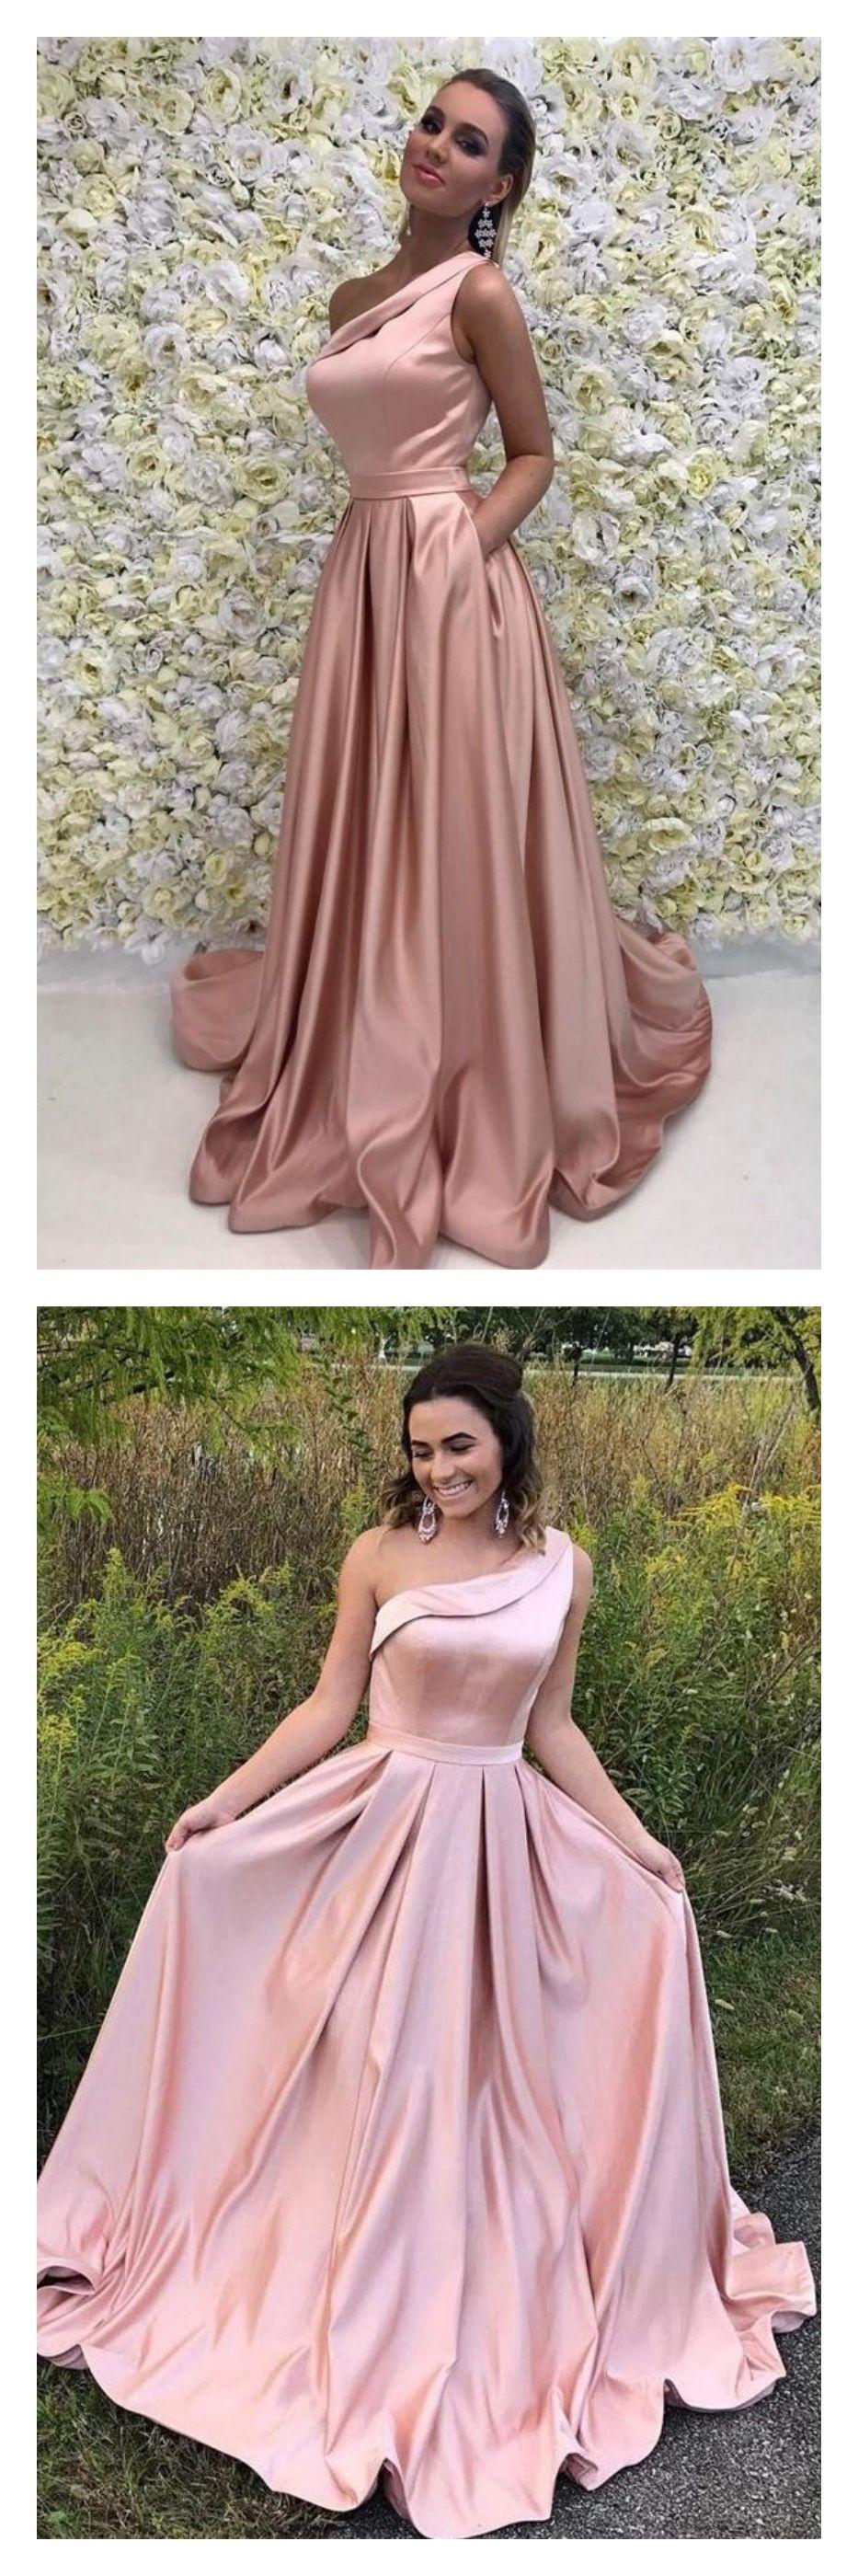 Prom dresses prom dresses prom dresses long prom